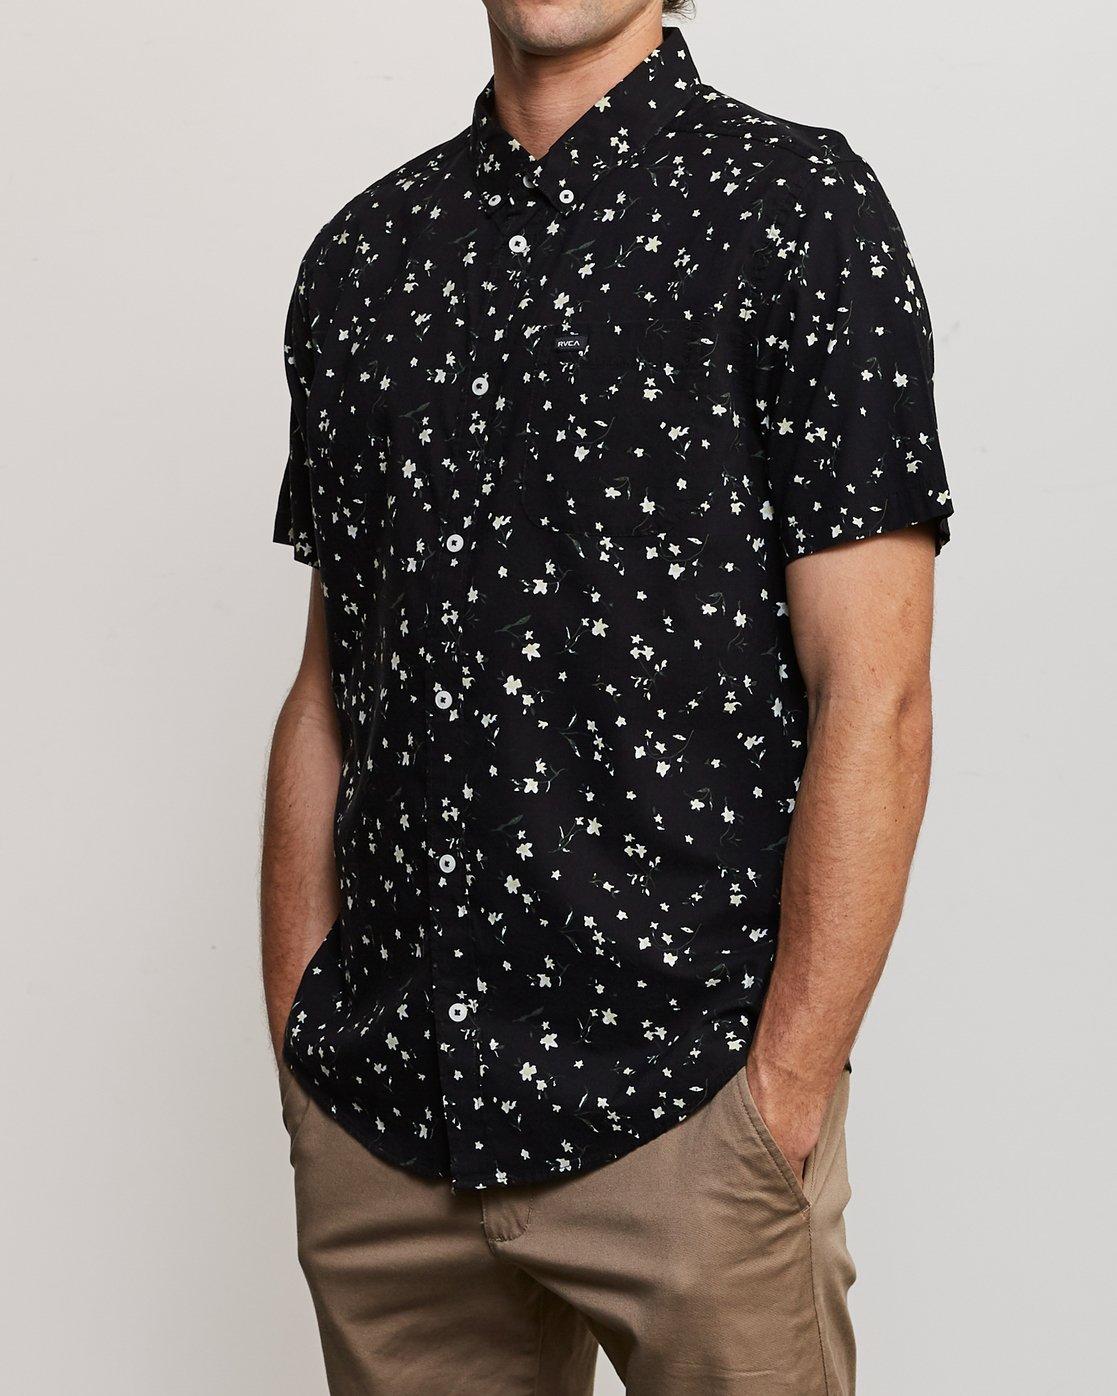 2 Elegie Floral Button-Up Shirt Black M565UREF RVCA